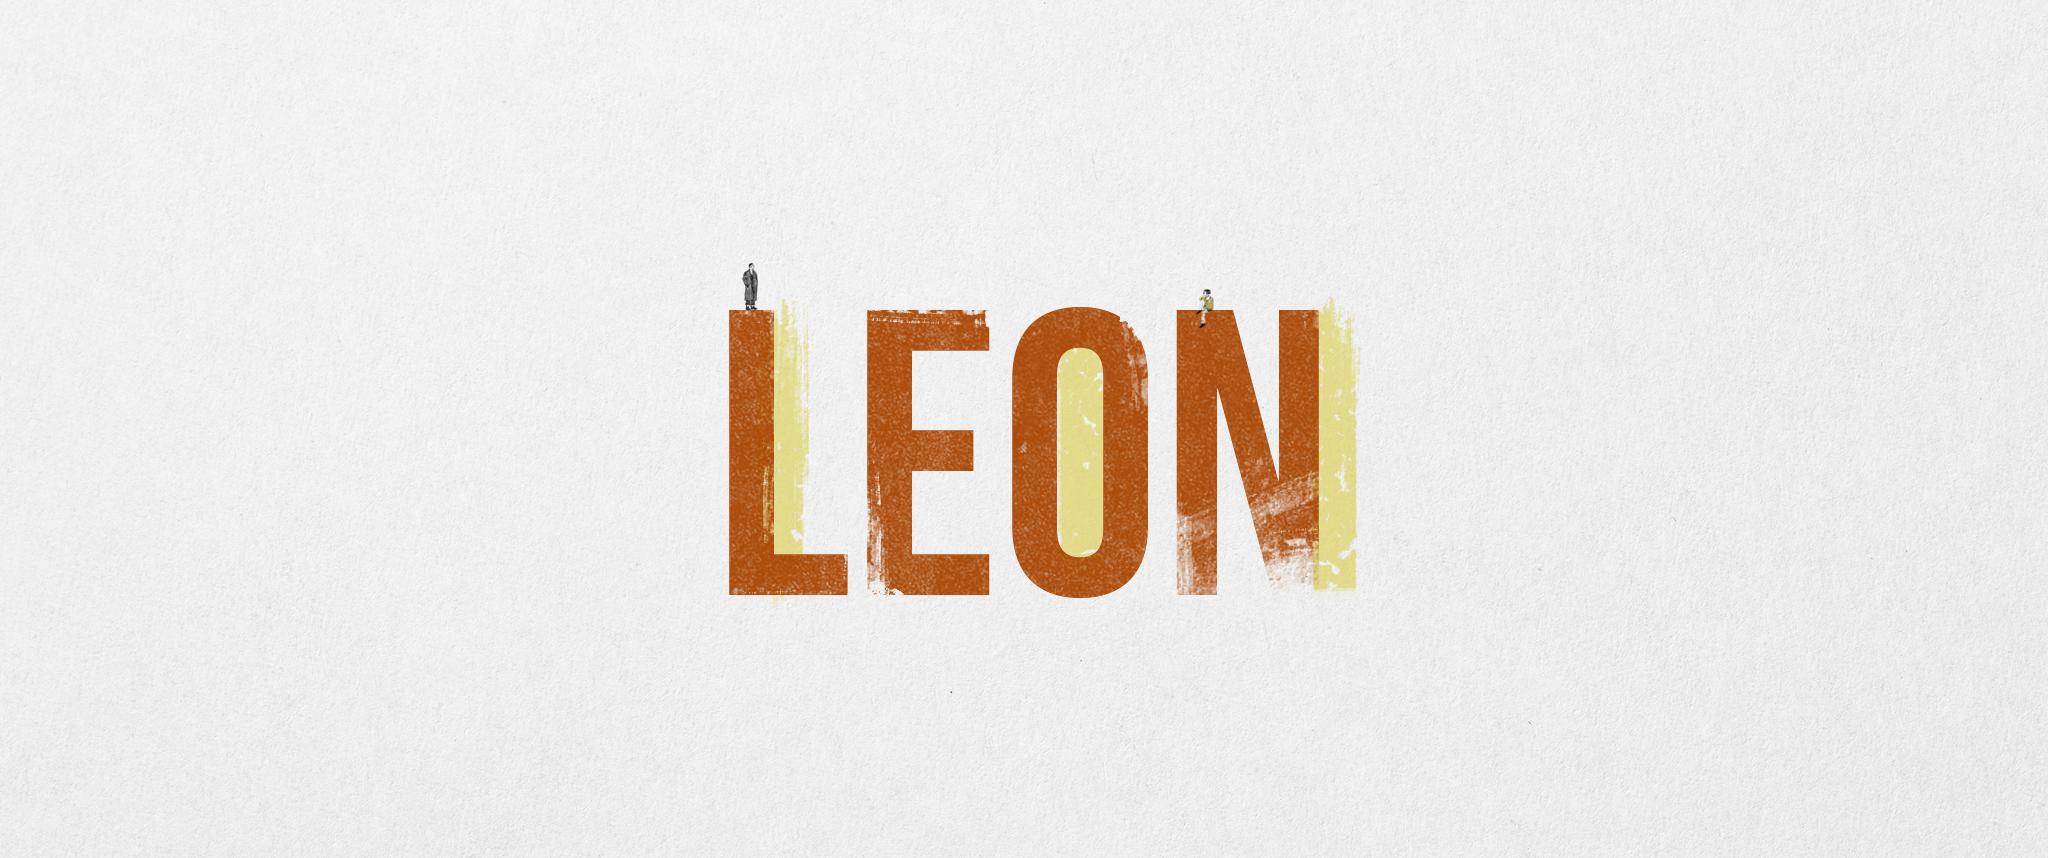 leon_7.jpg